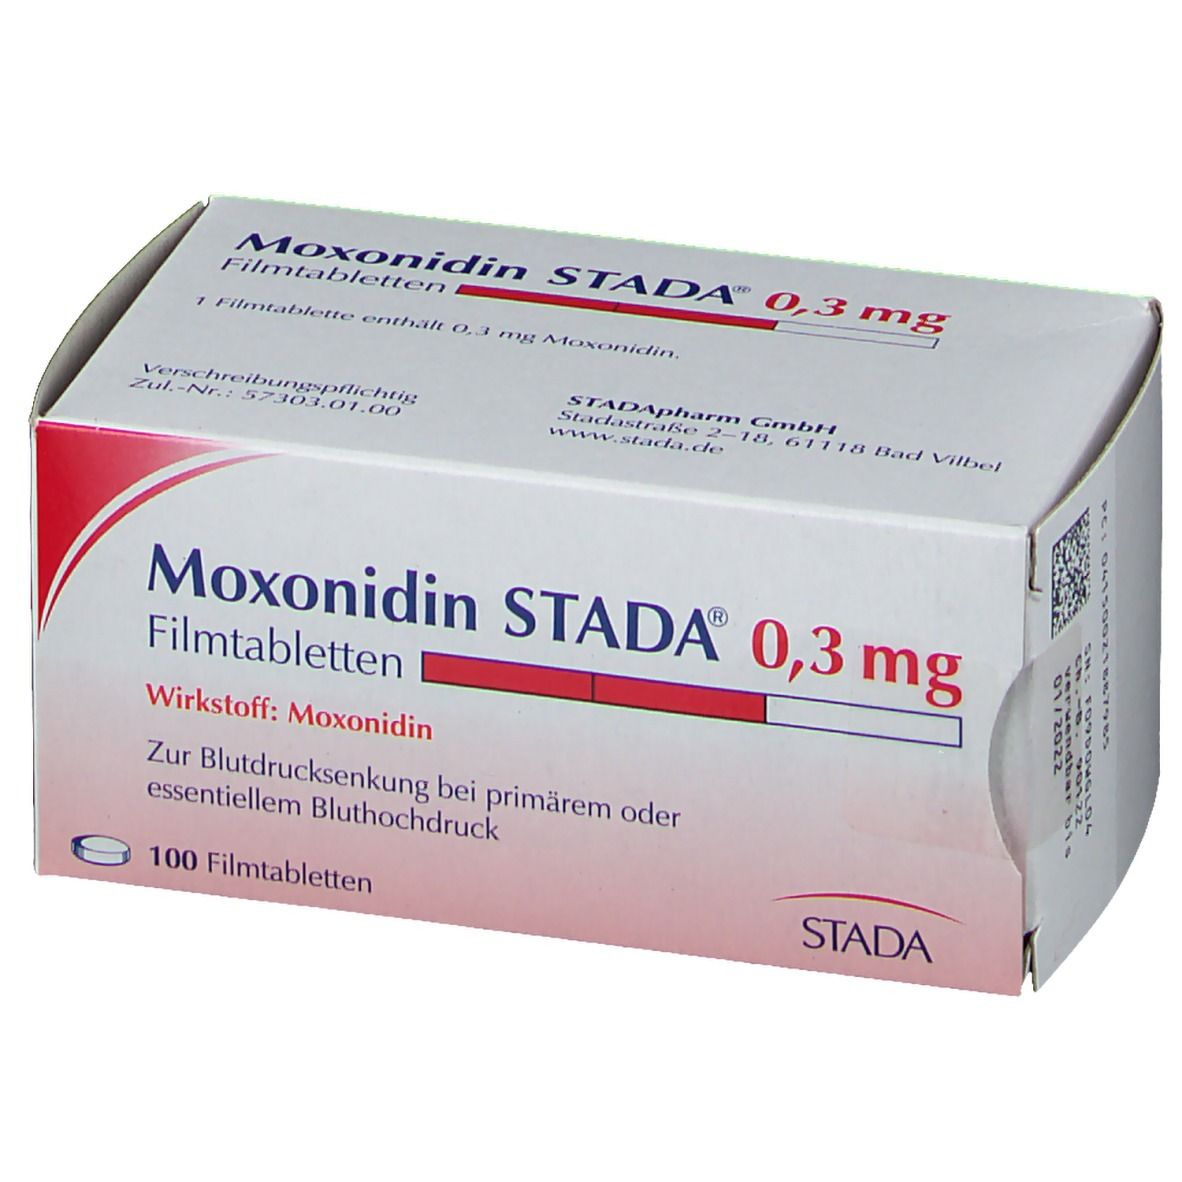 Moxonidin STADA® 0,3 mg Filmtabletten